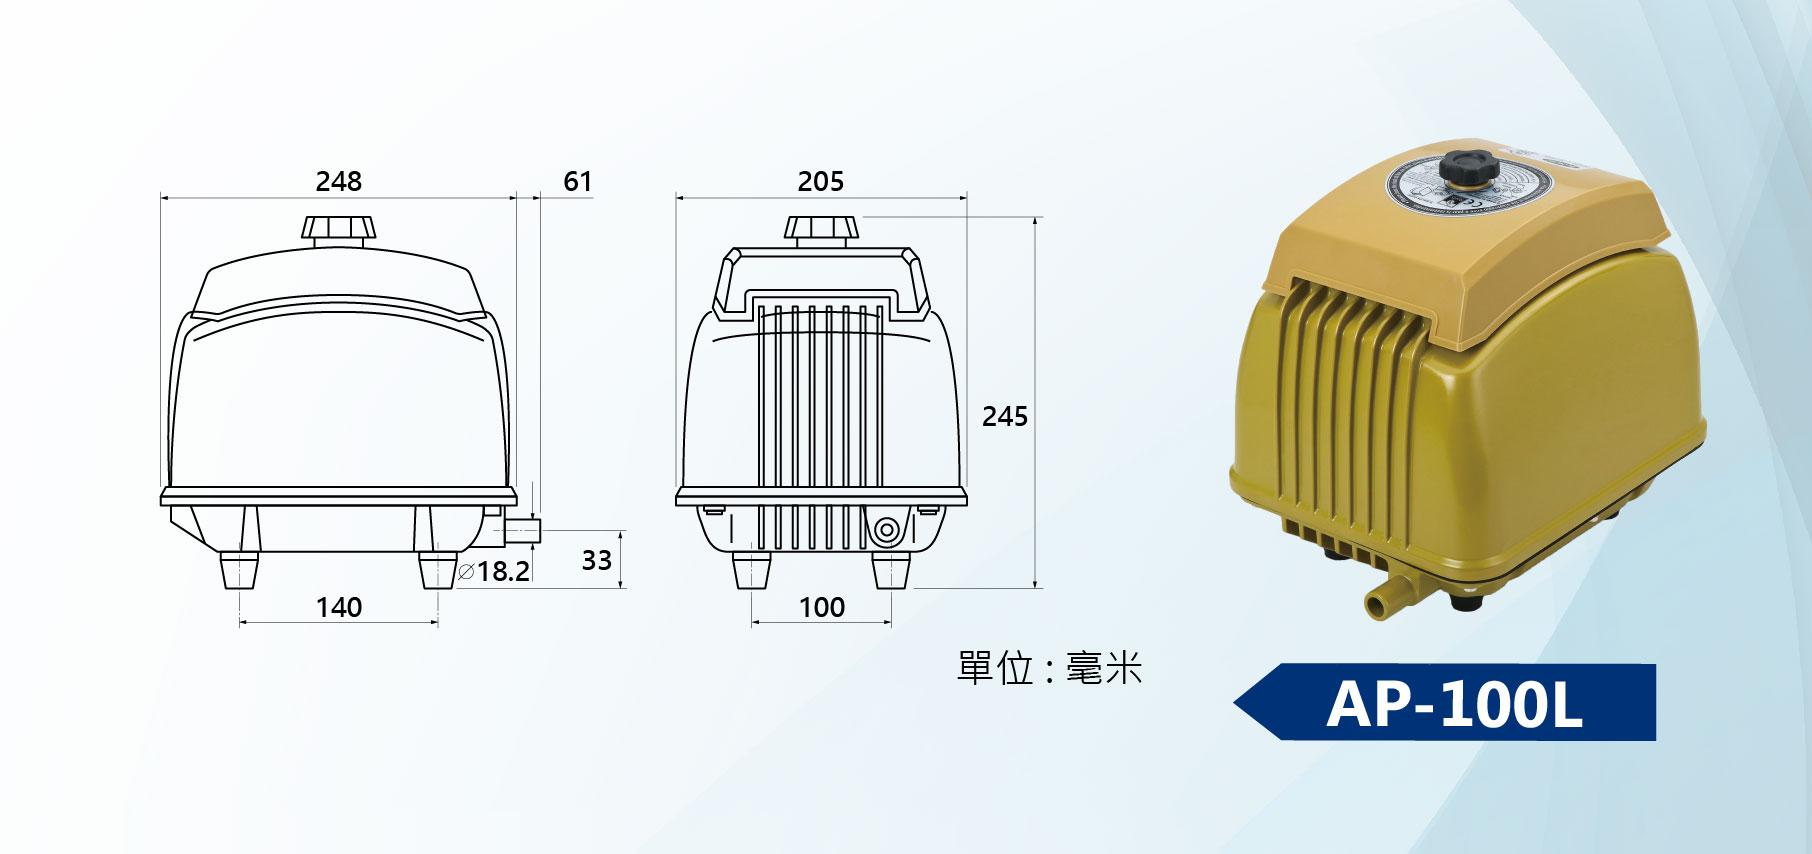 AP-100Lリニアエアーポンプ寸法